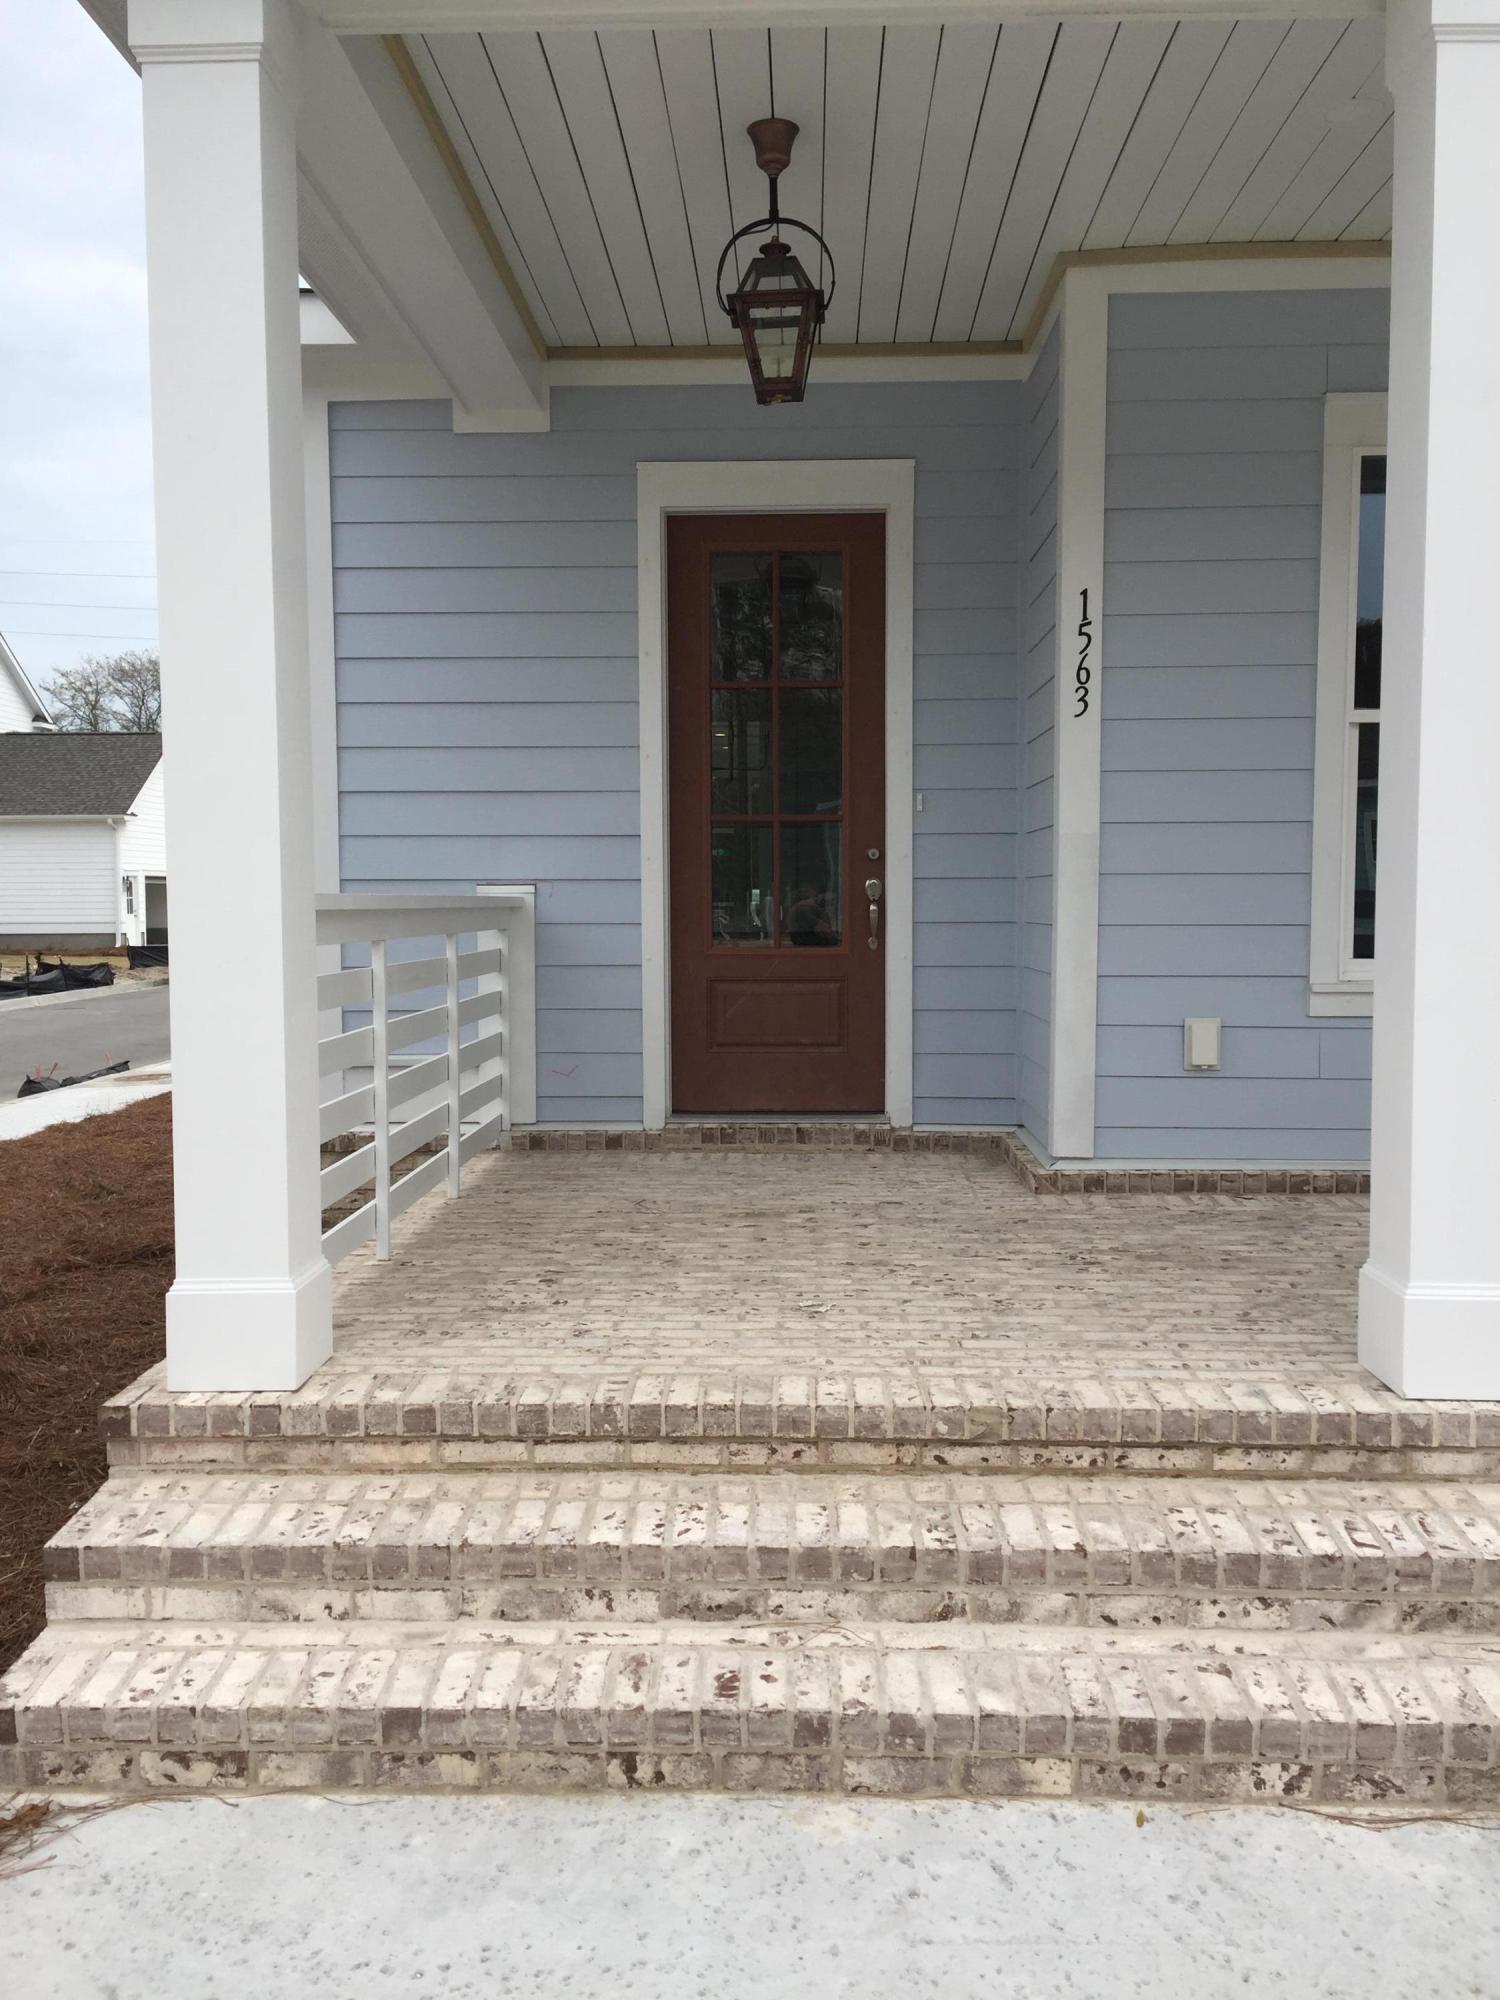 Midtown Homes For Sale - 1525 Kepley S., Mount Pleasant, SC - 6